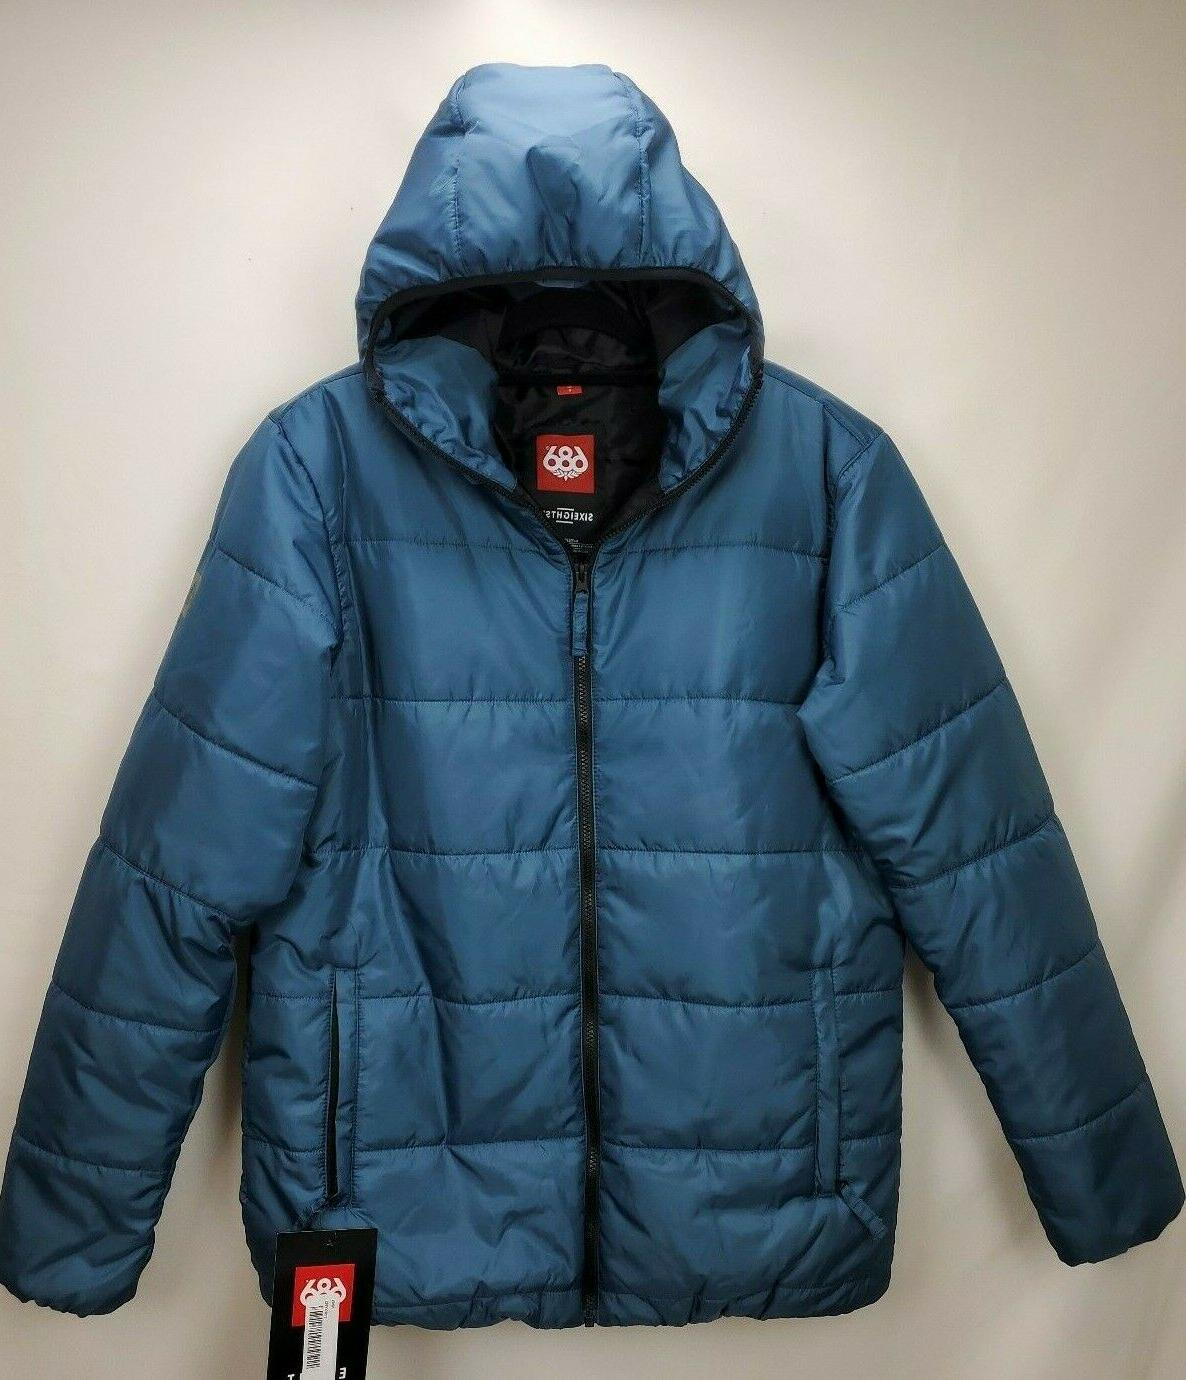 686 mens warmix puffer snowboard ski jacket